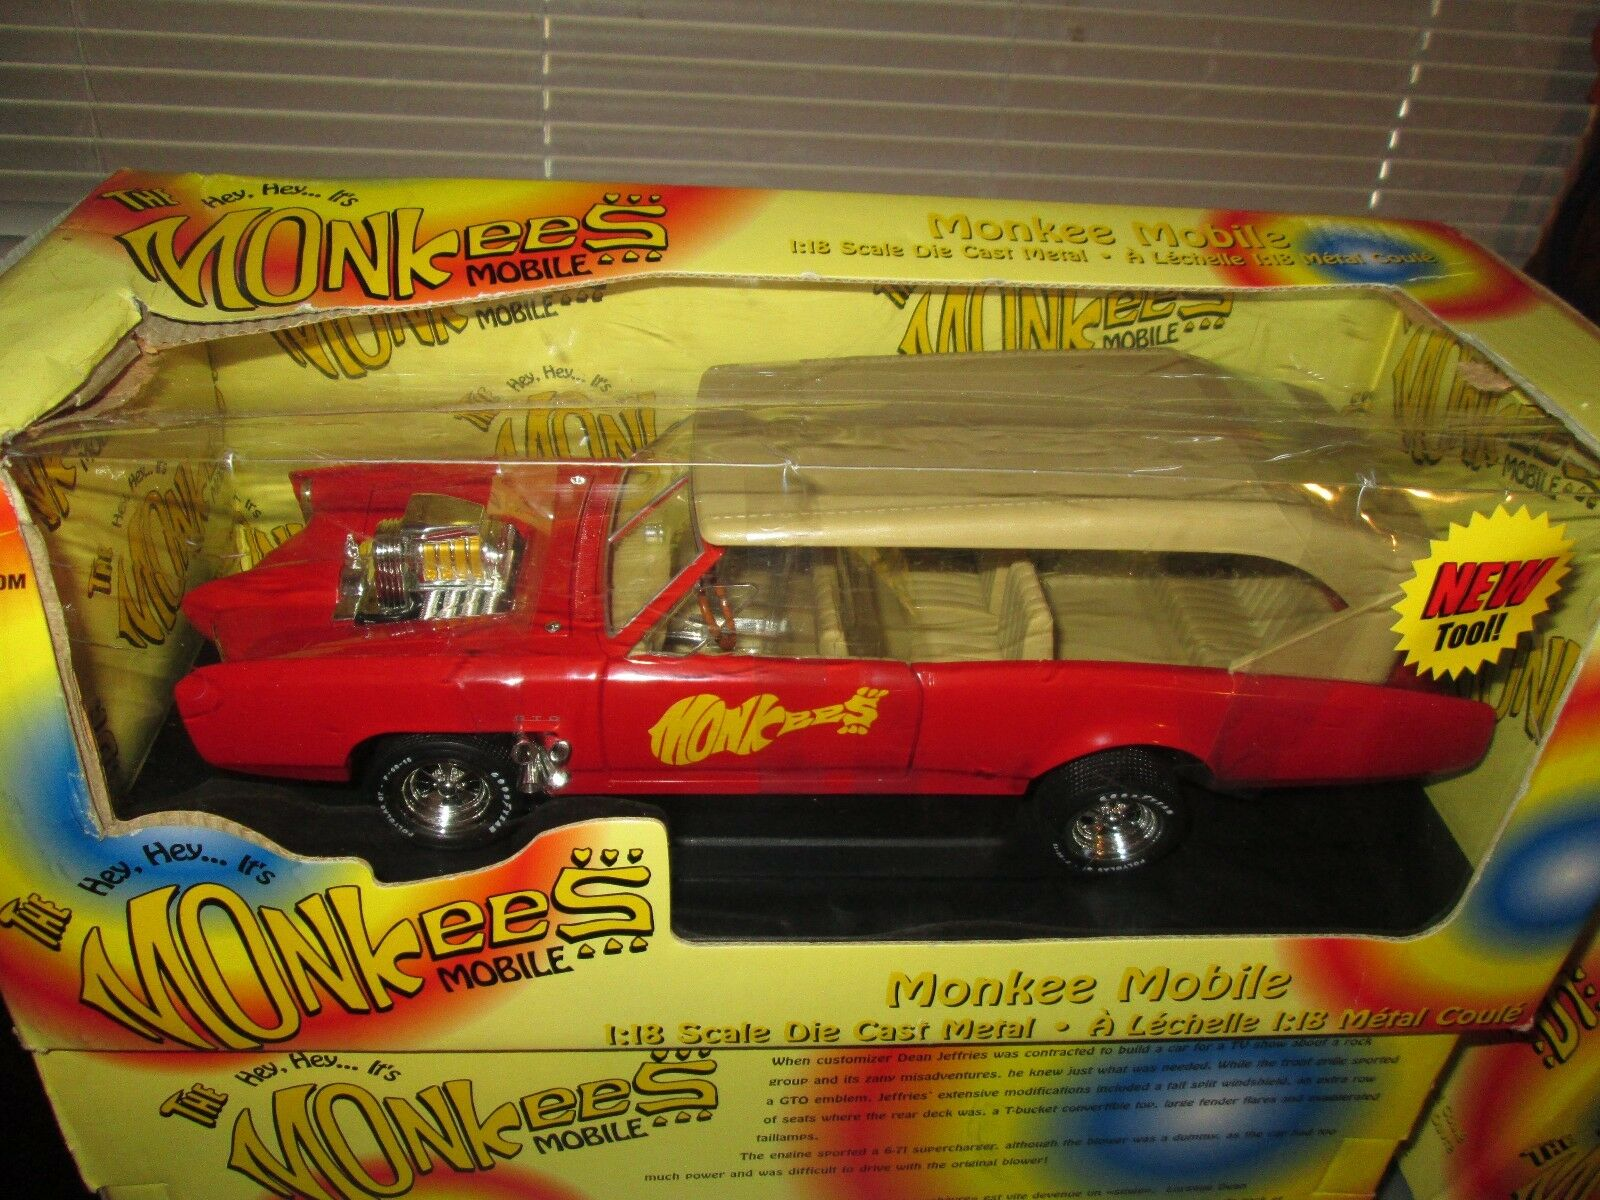 Monkees Mobile American Muscle Gto Pontiac 1 1 1 18 Affen Ertl d07d95